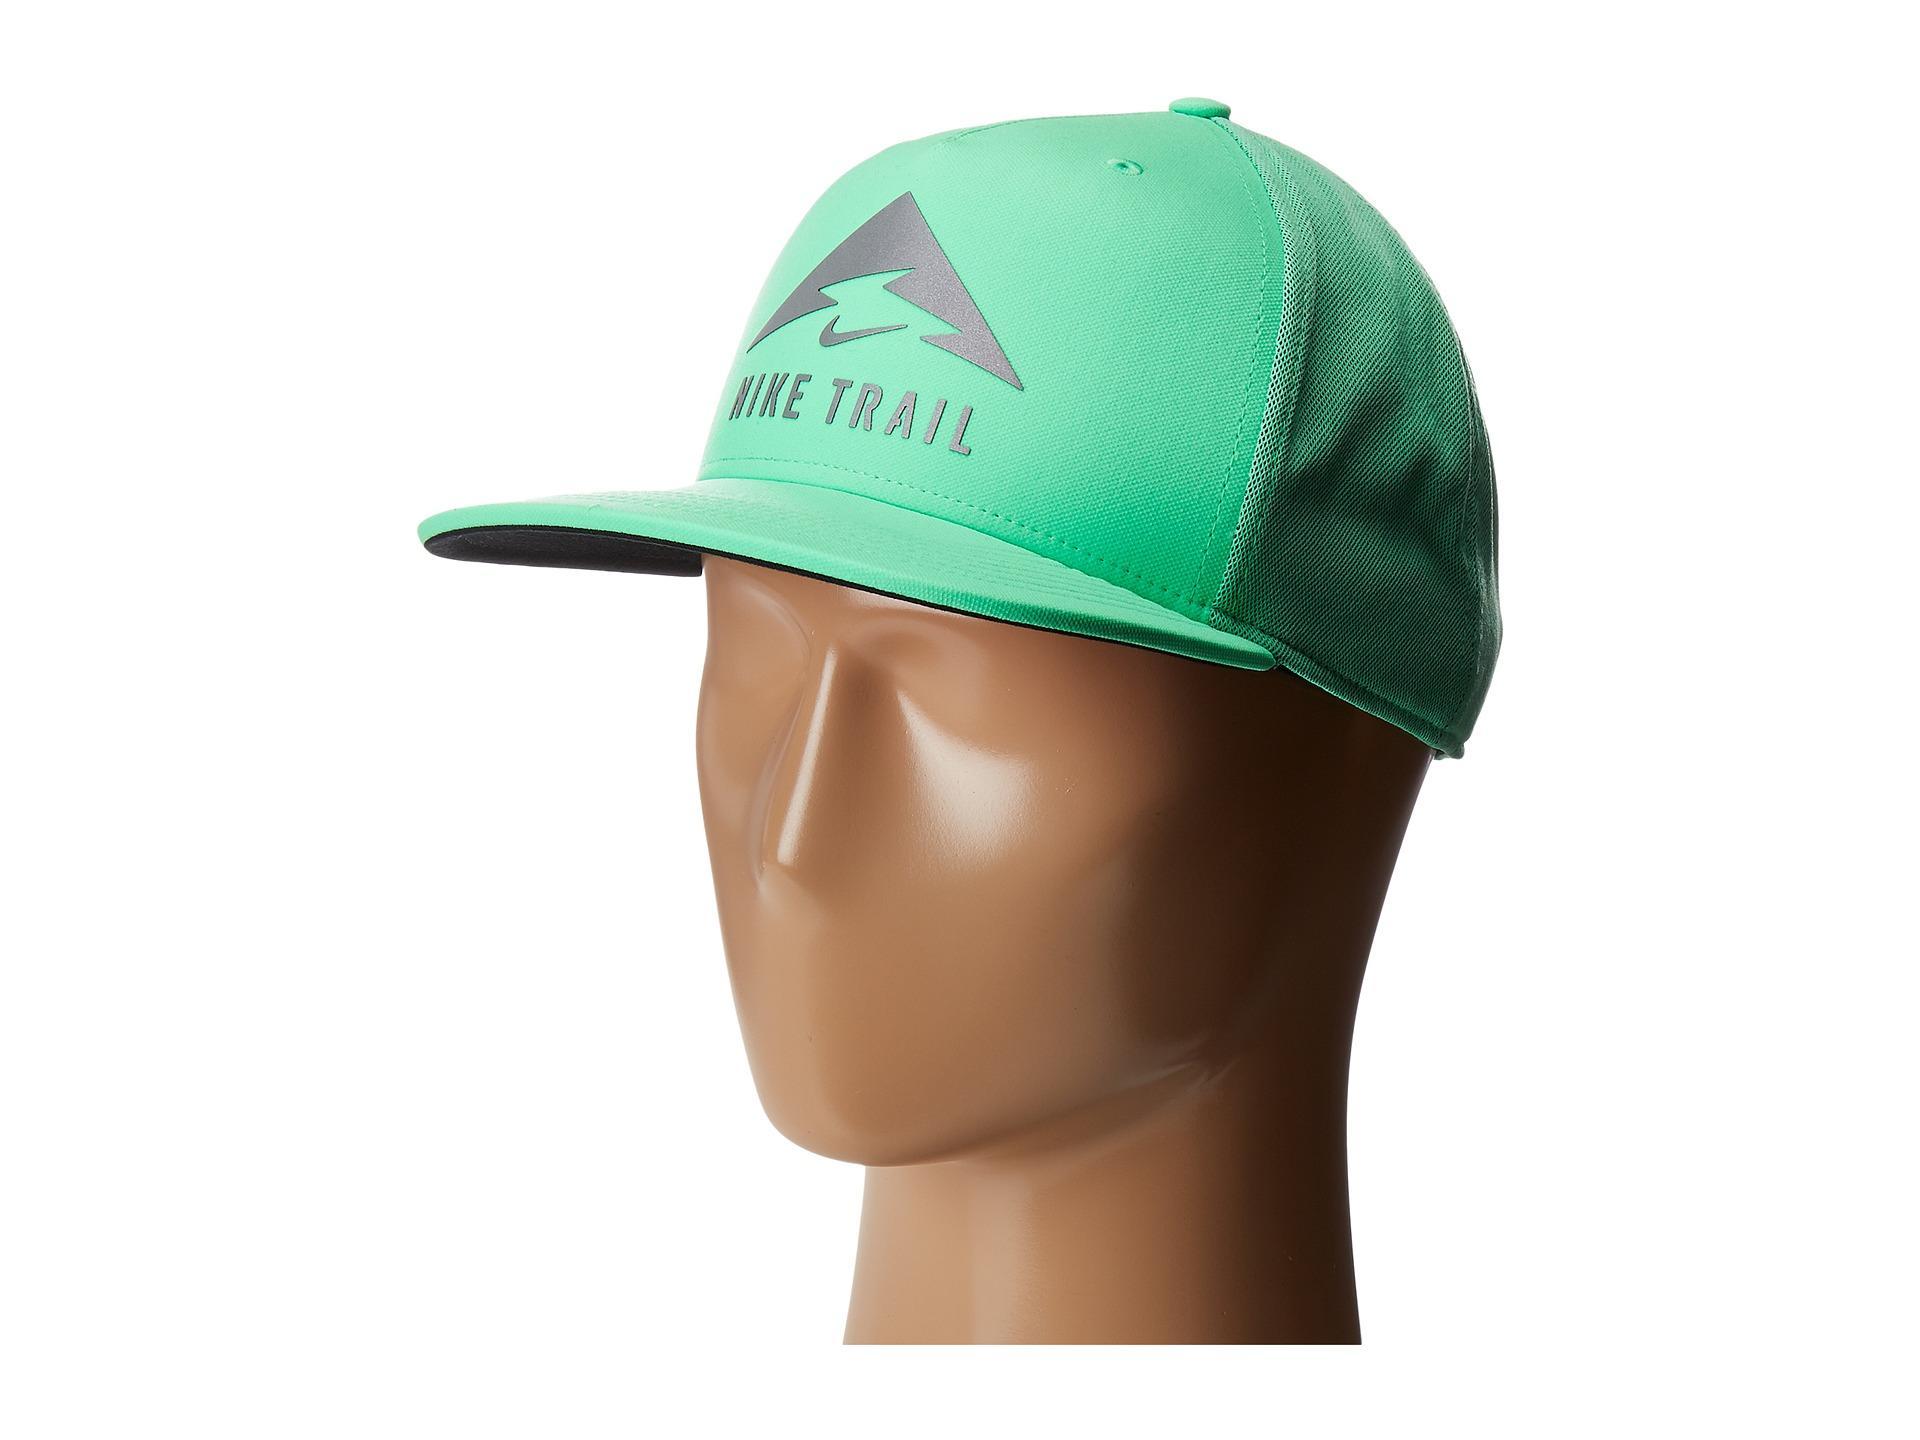 b384aab547807 Nike Aerobill Trail Cap in Green - Lyst